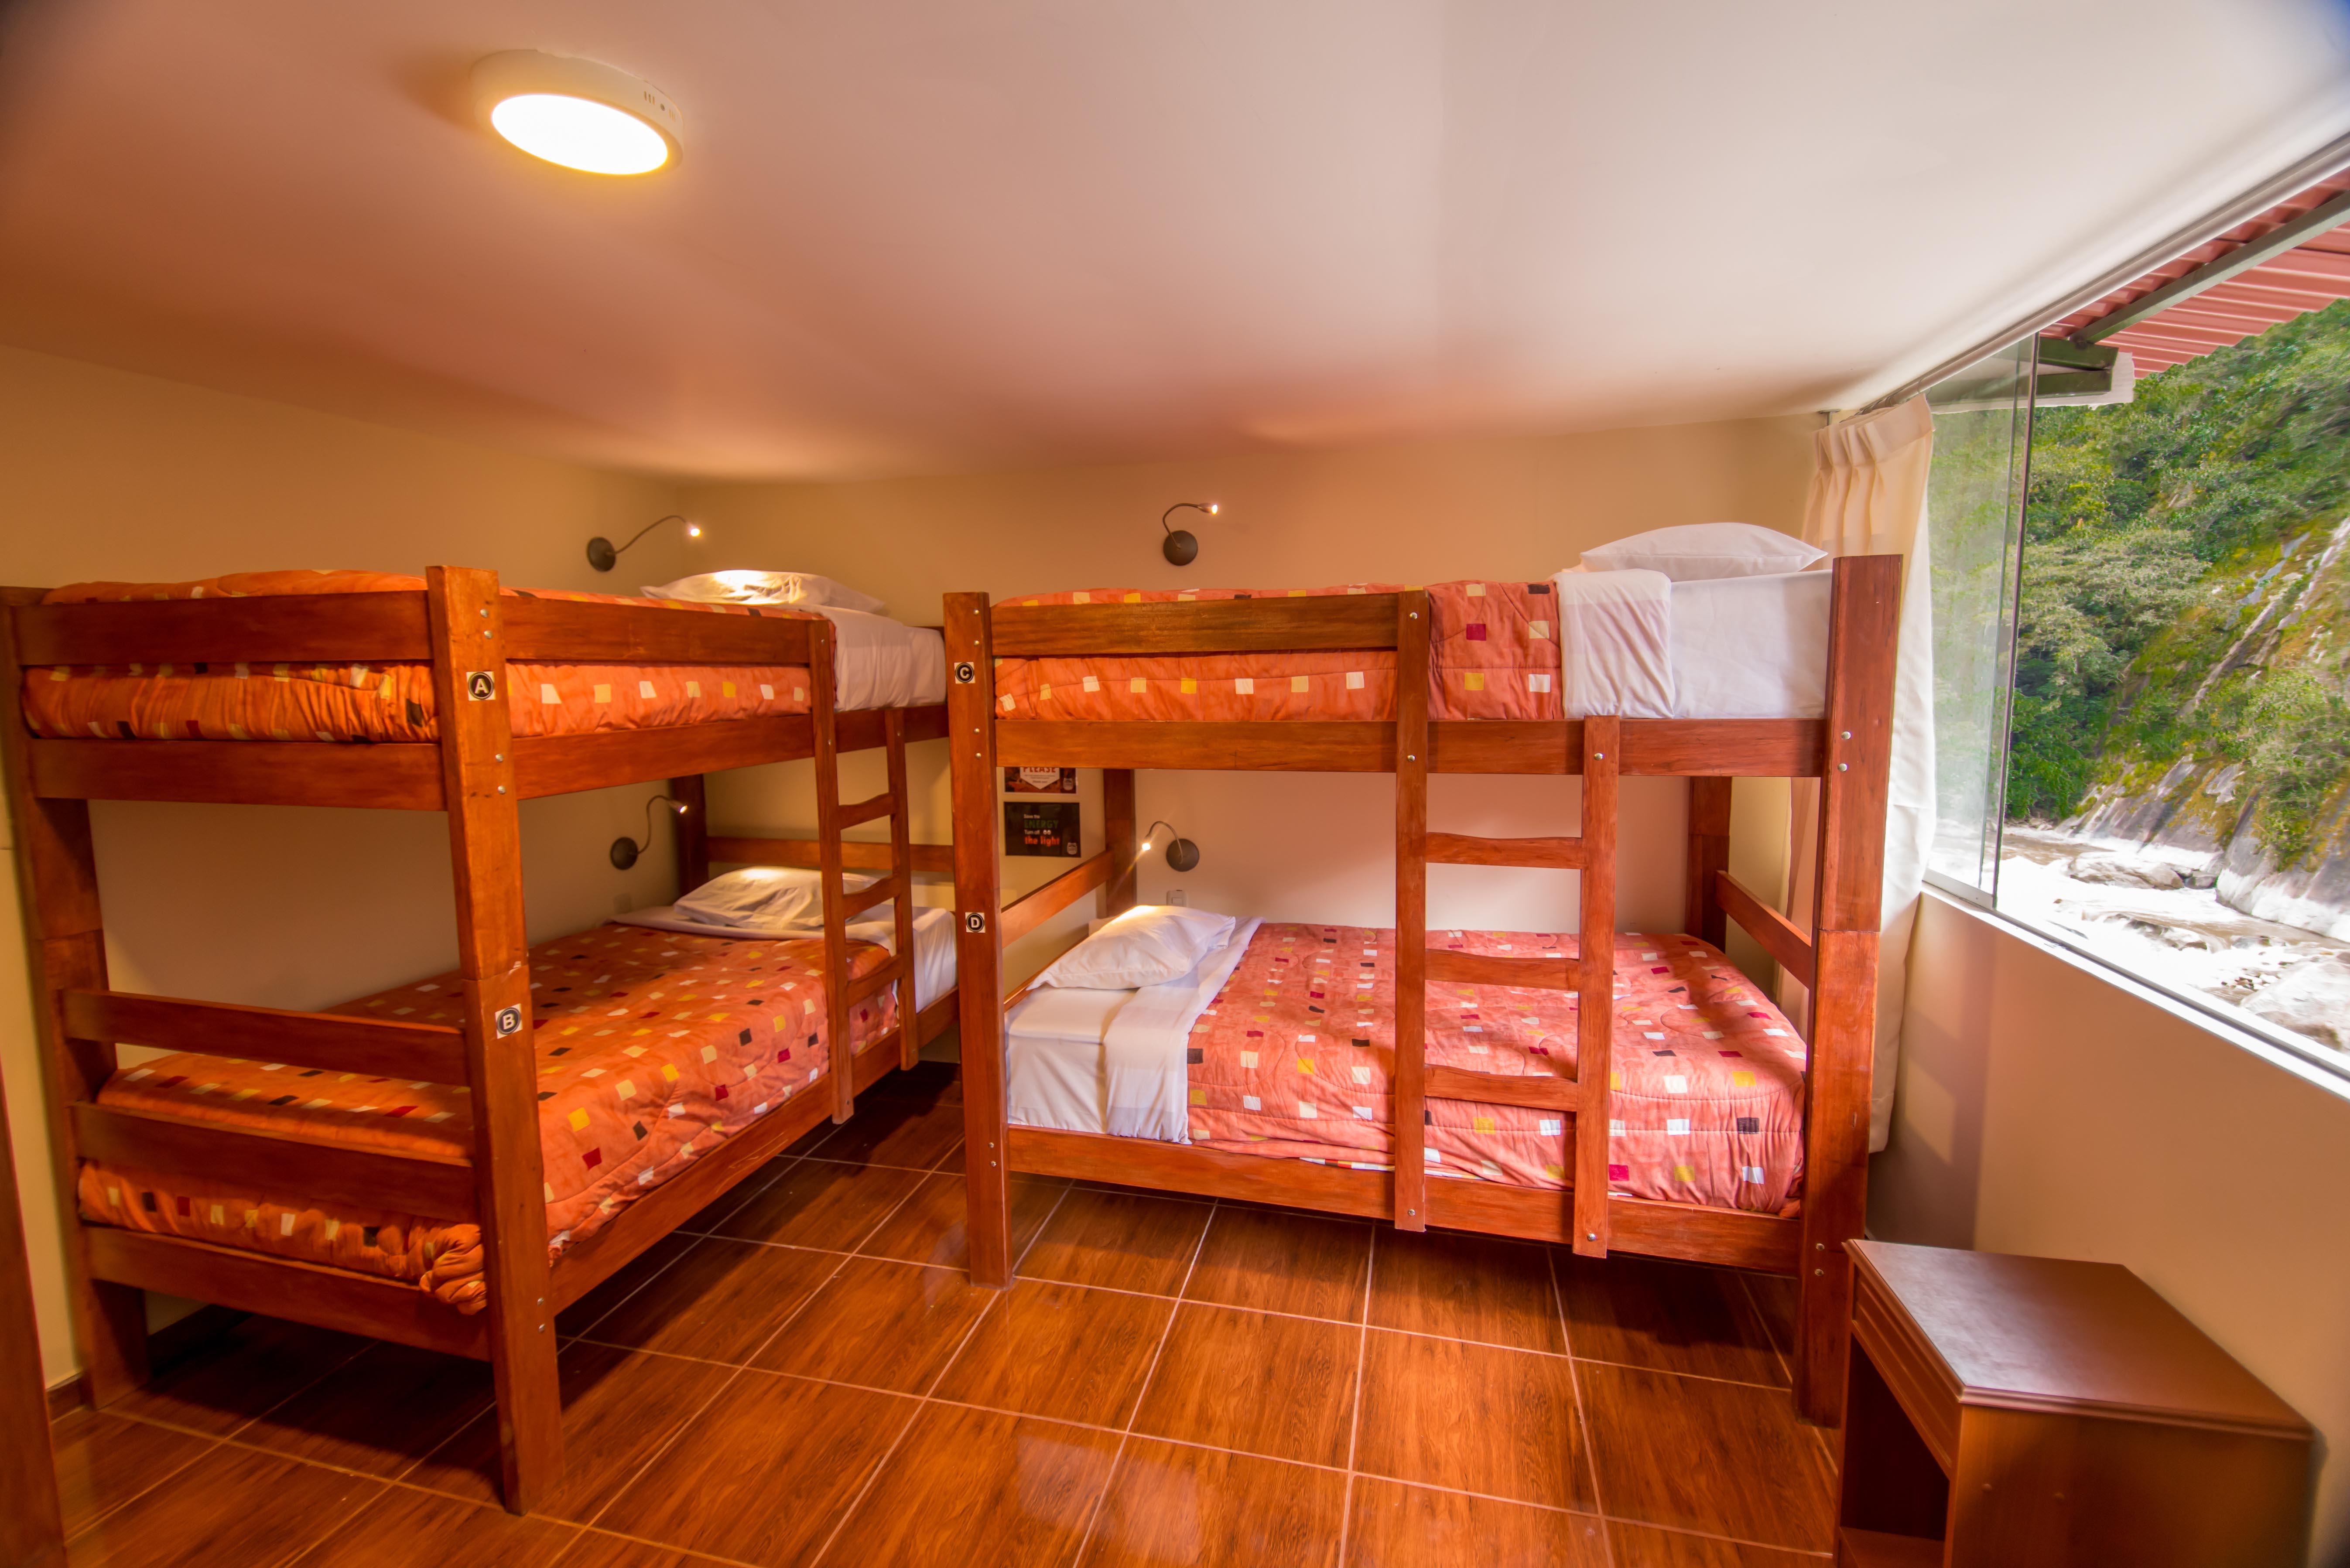 HOSTEL - Casa MachuPicchu Hostel